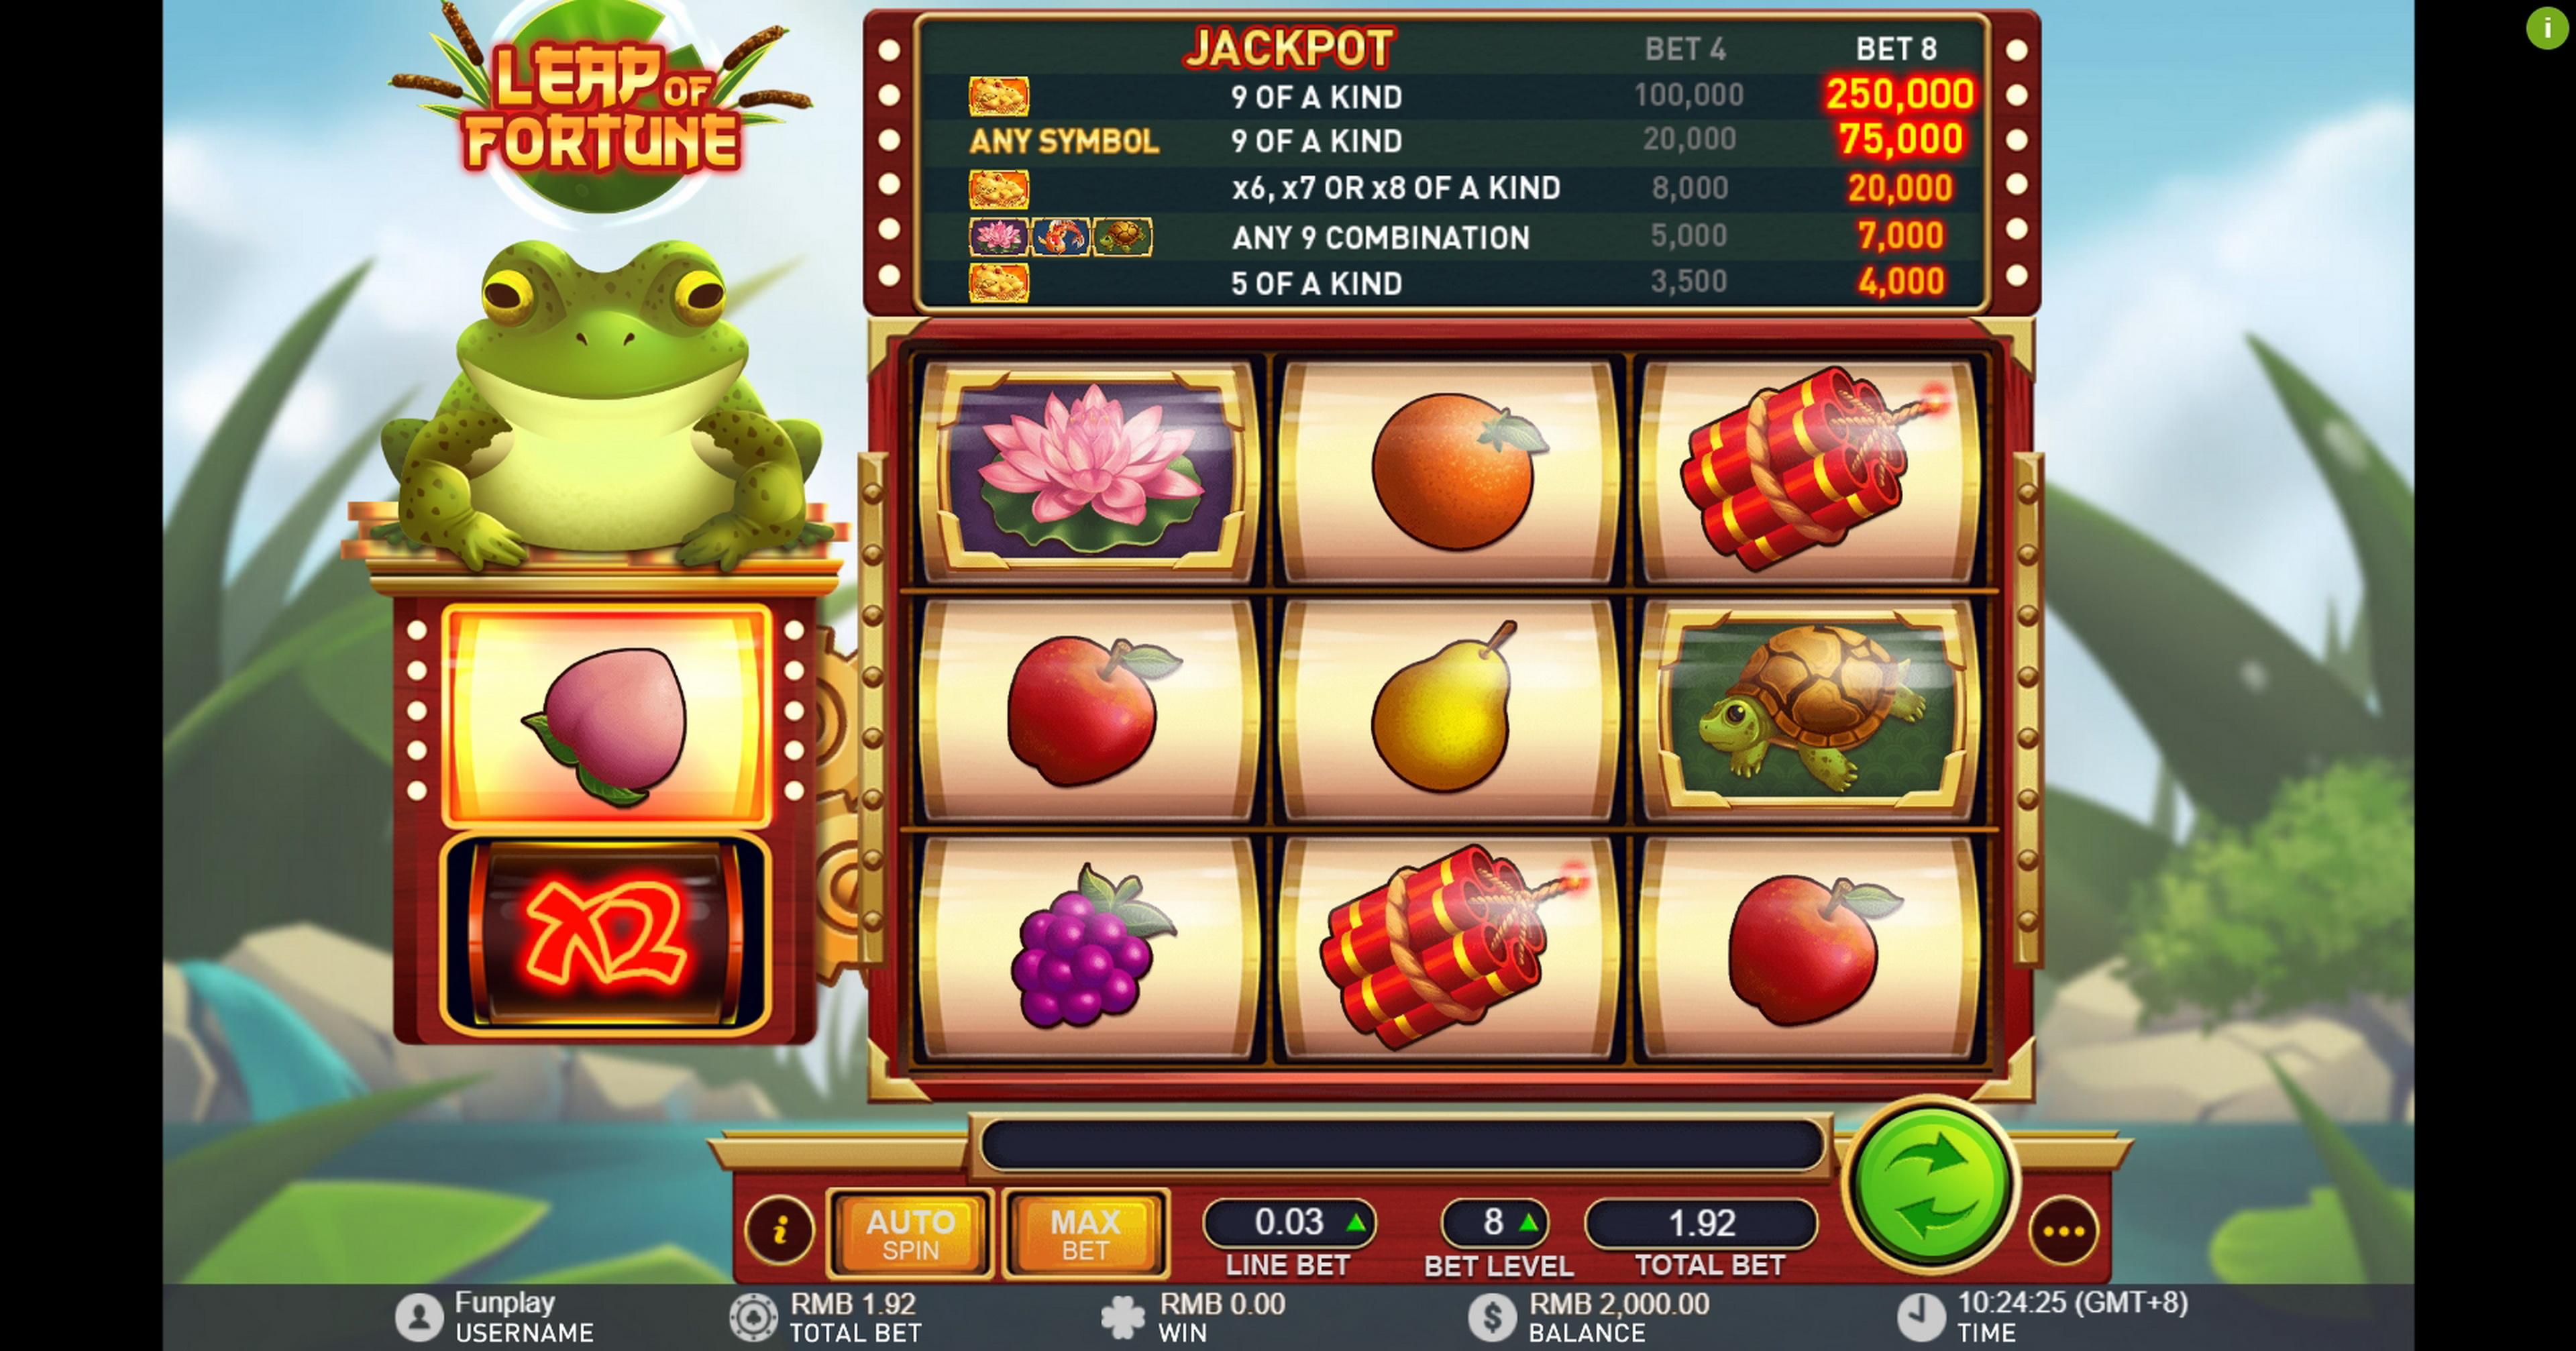 Mondial casino